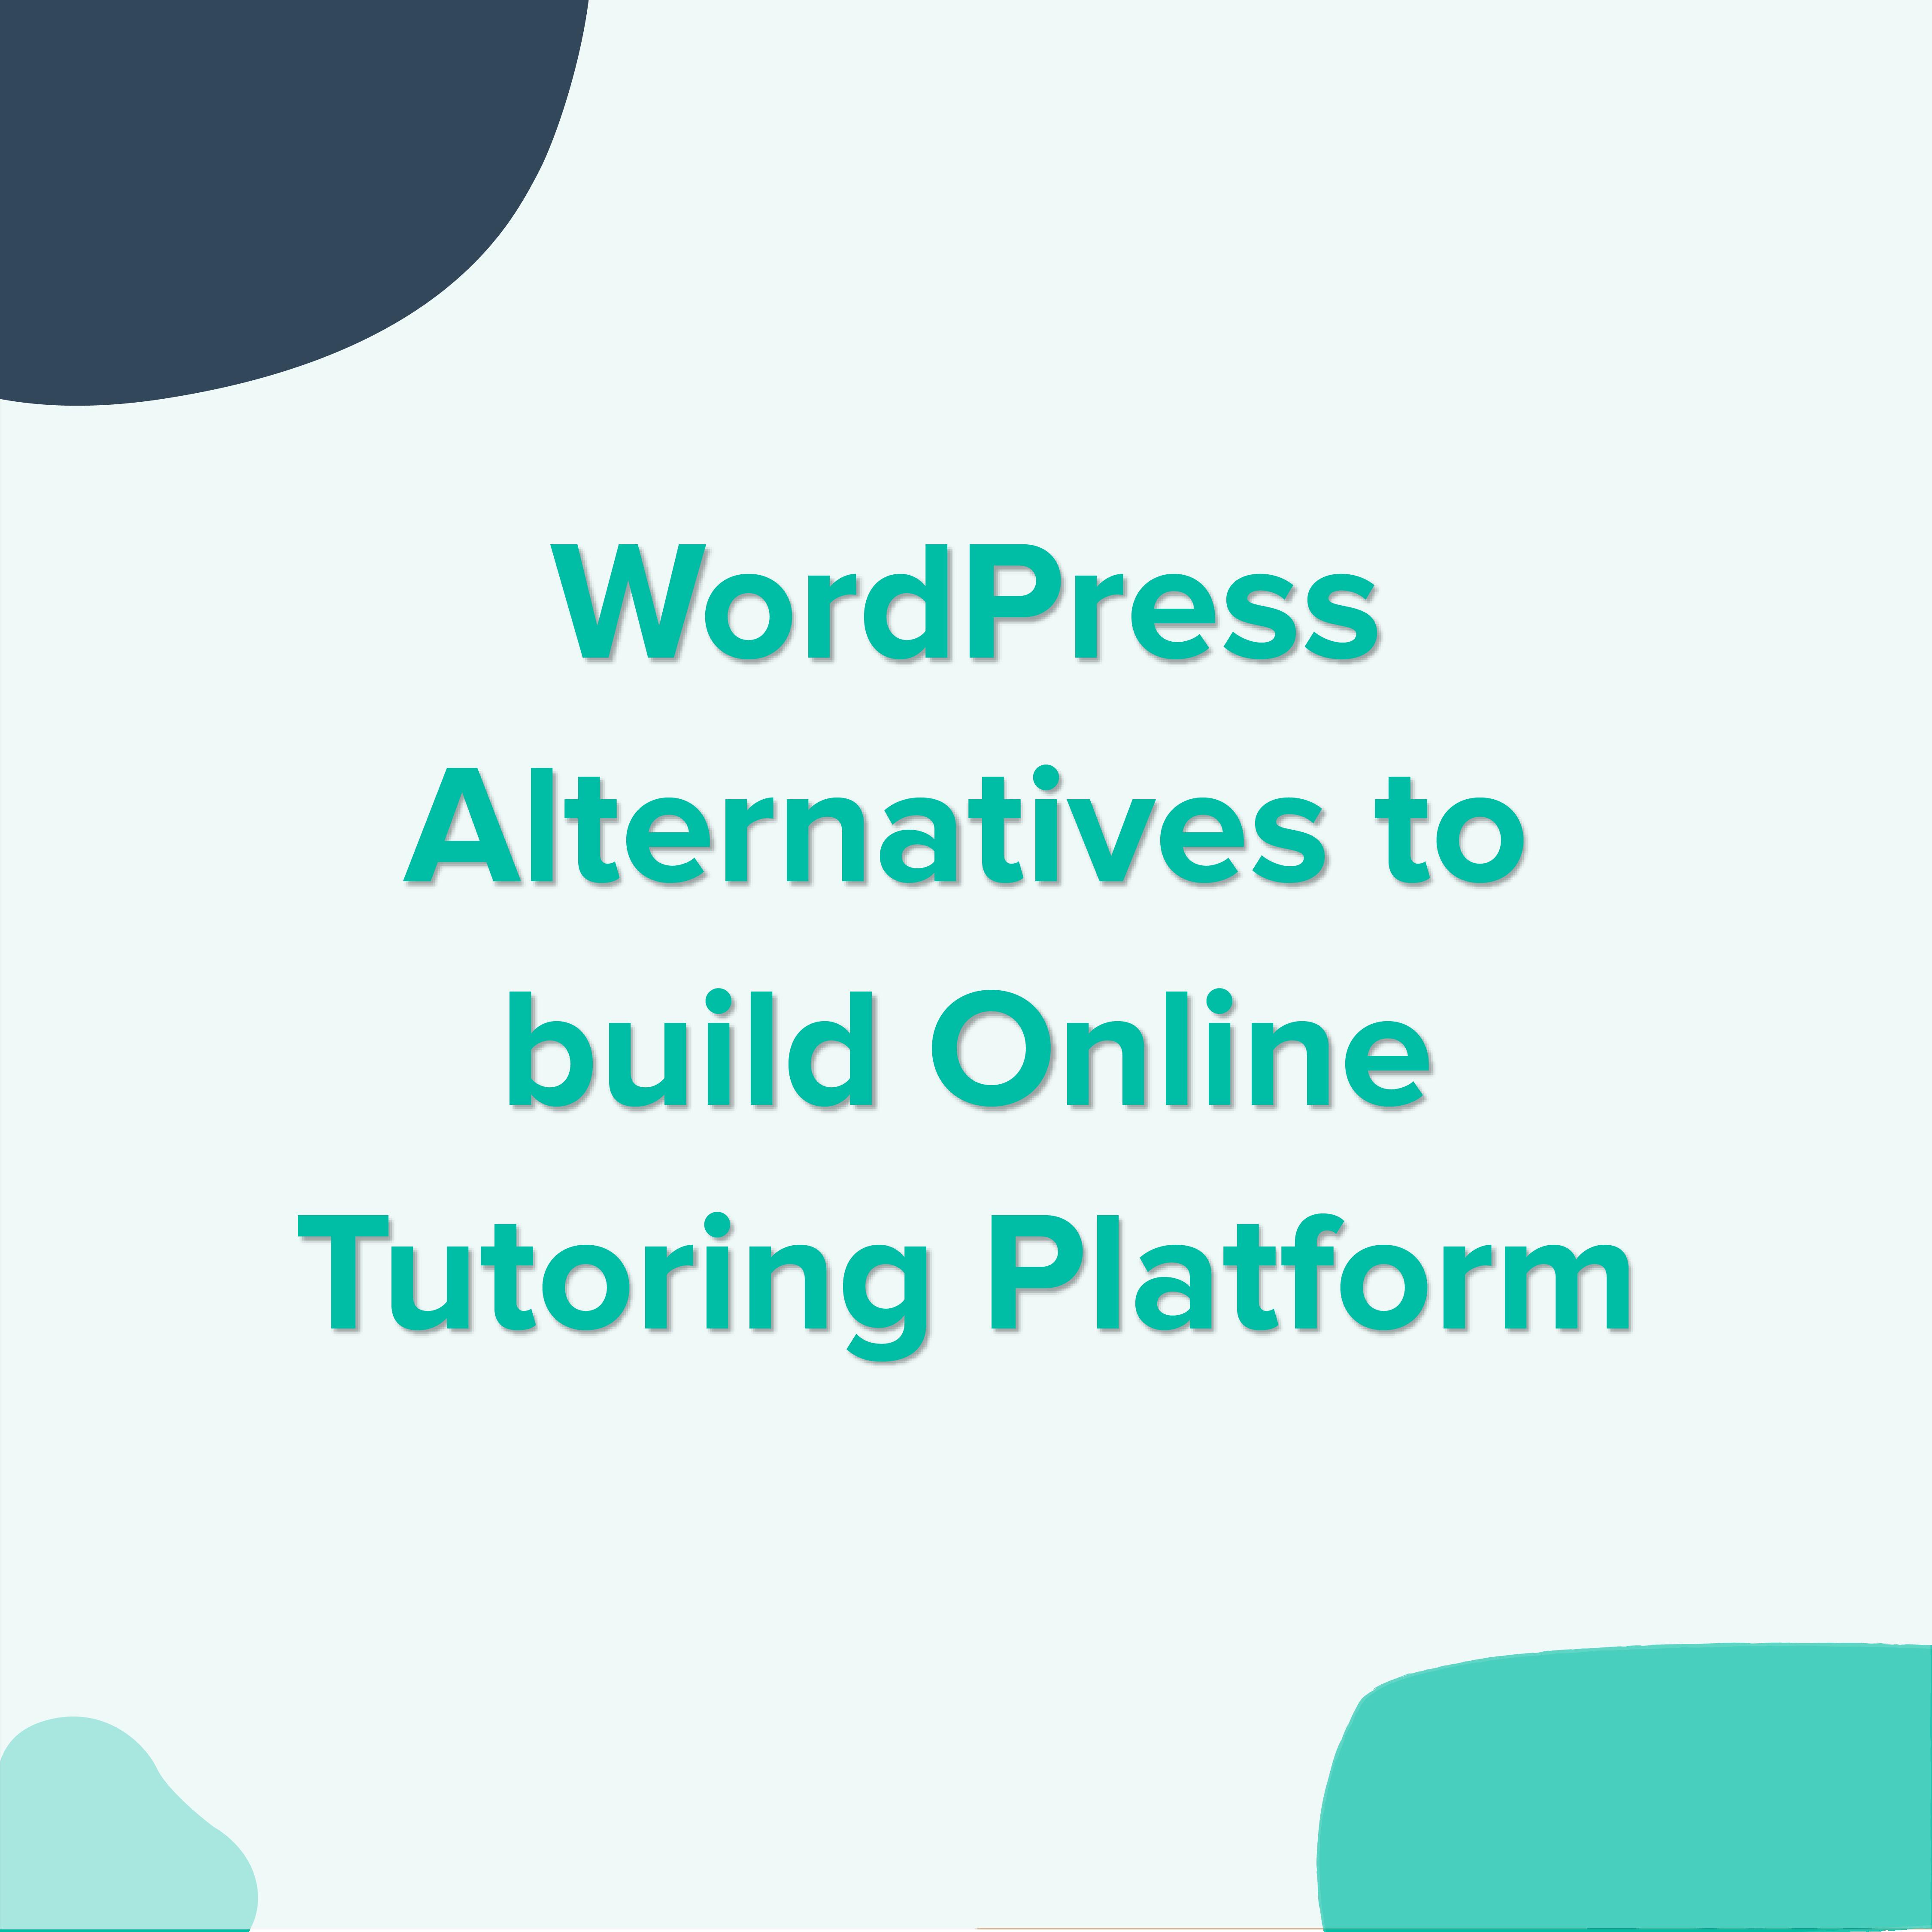 wordpress-alternatives-to-build-online-tutoring-platform